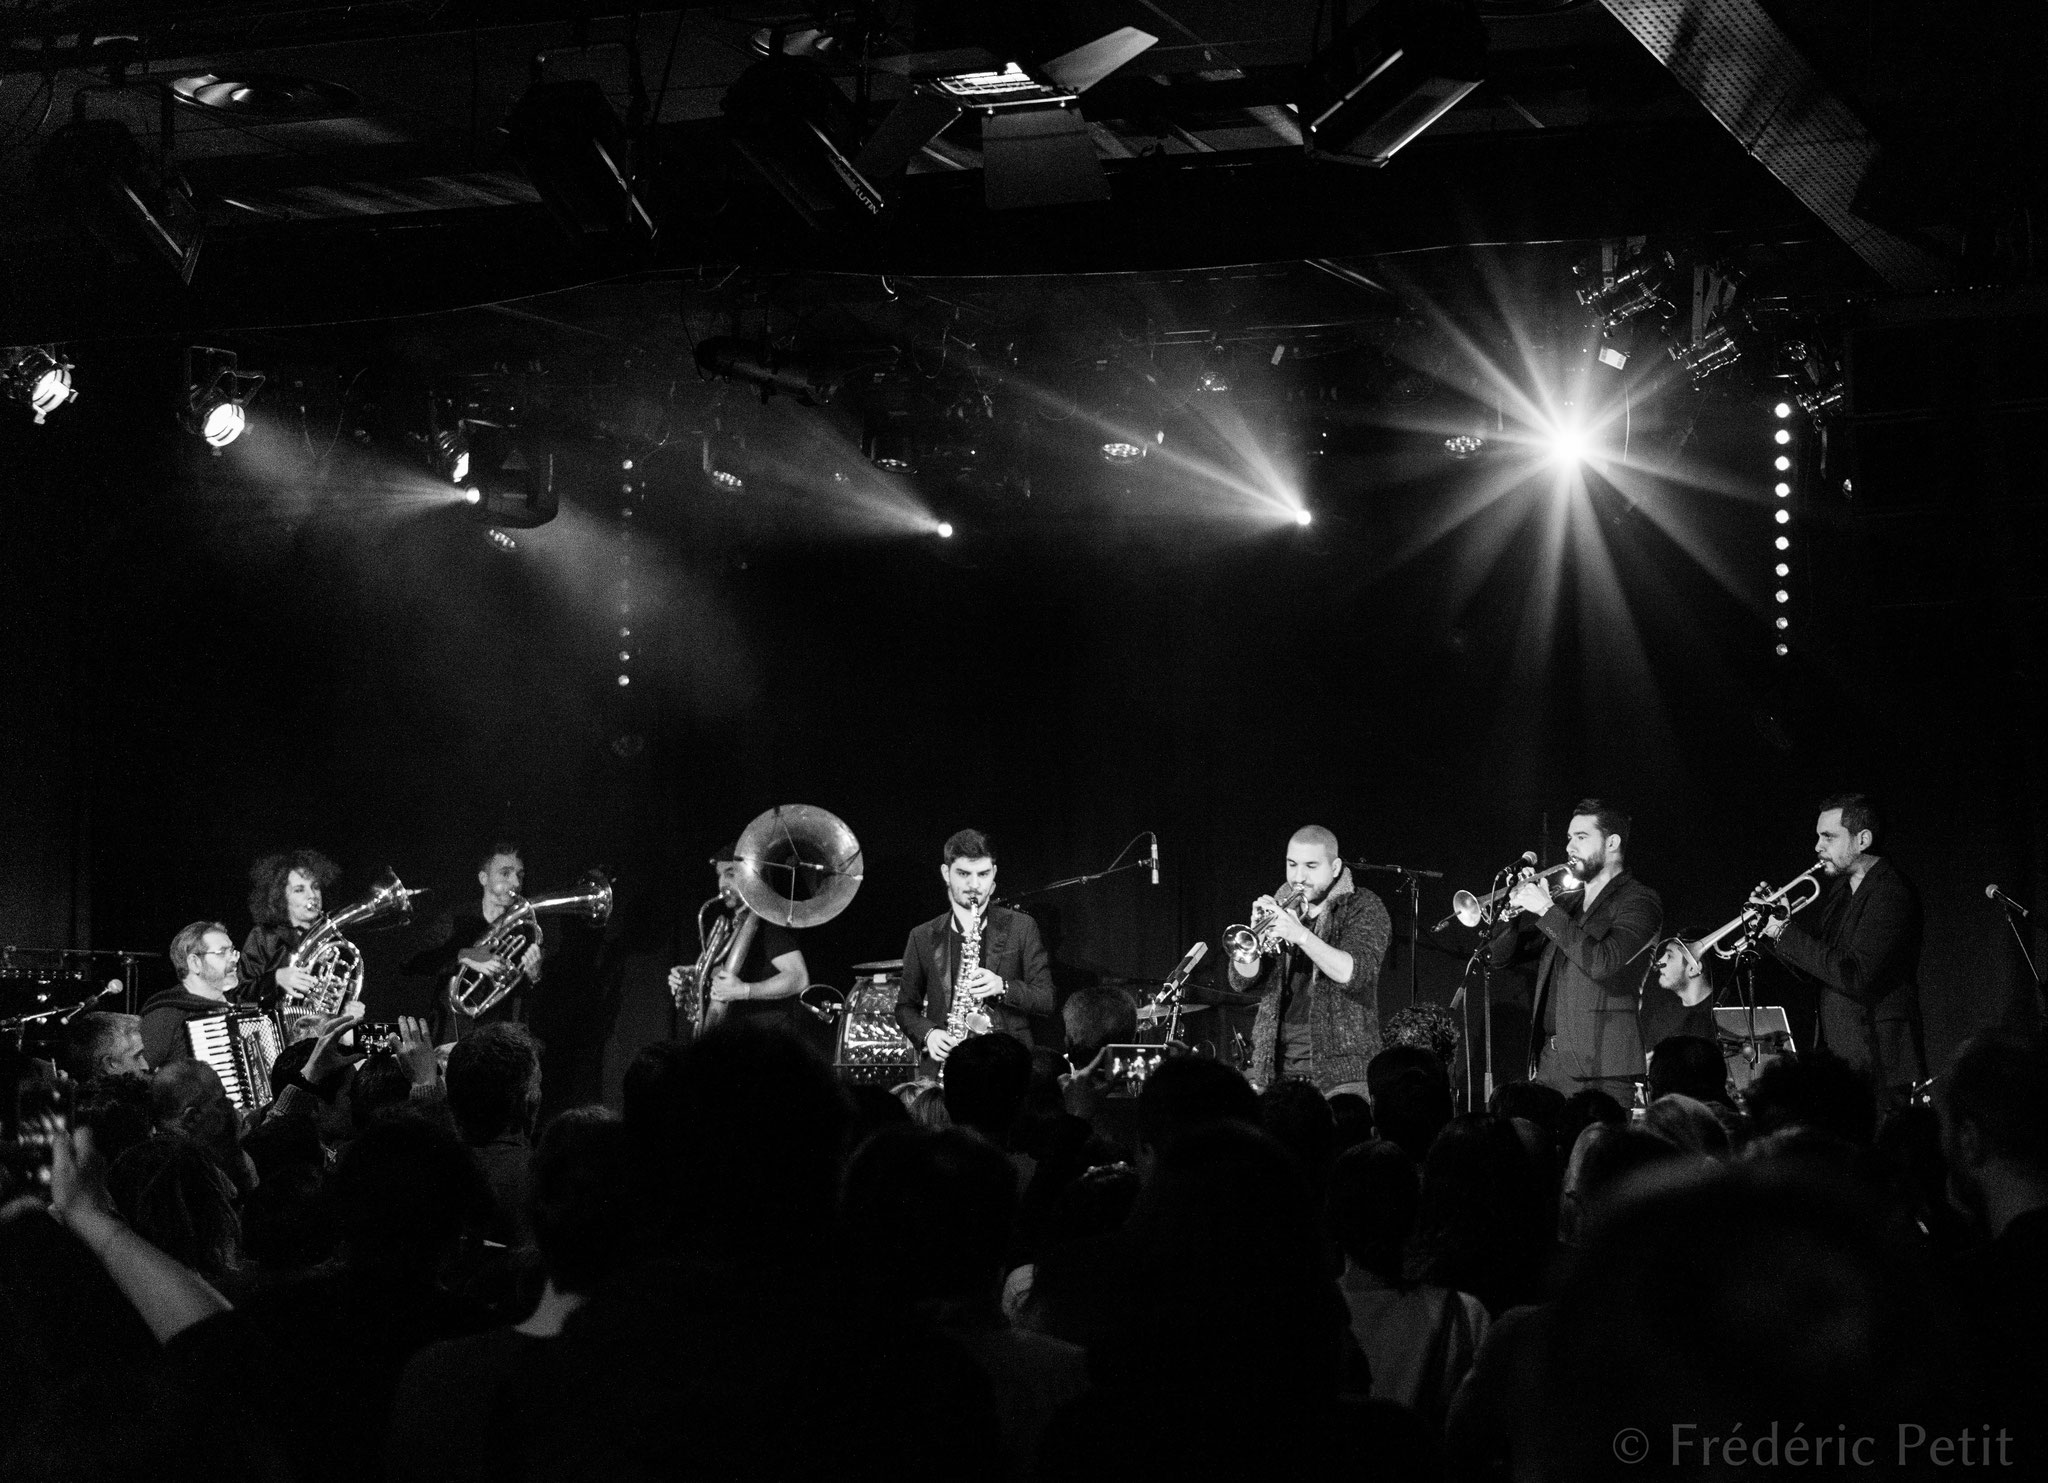 14 décembre 2018 - Ibrahim Maalouf & le Haïdouti Orkestar @ Pan Piper